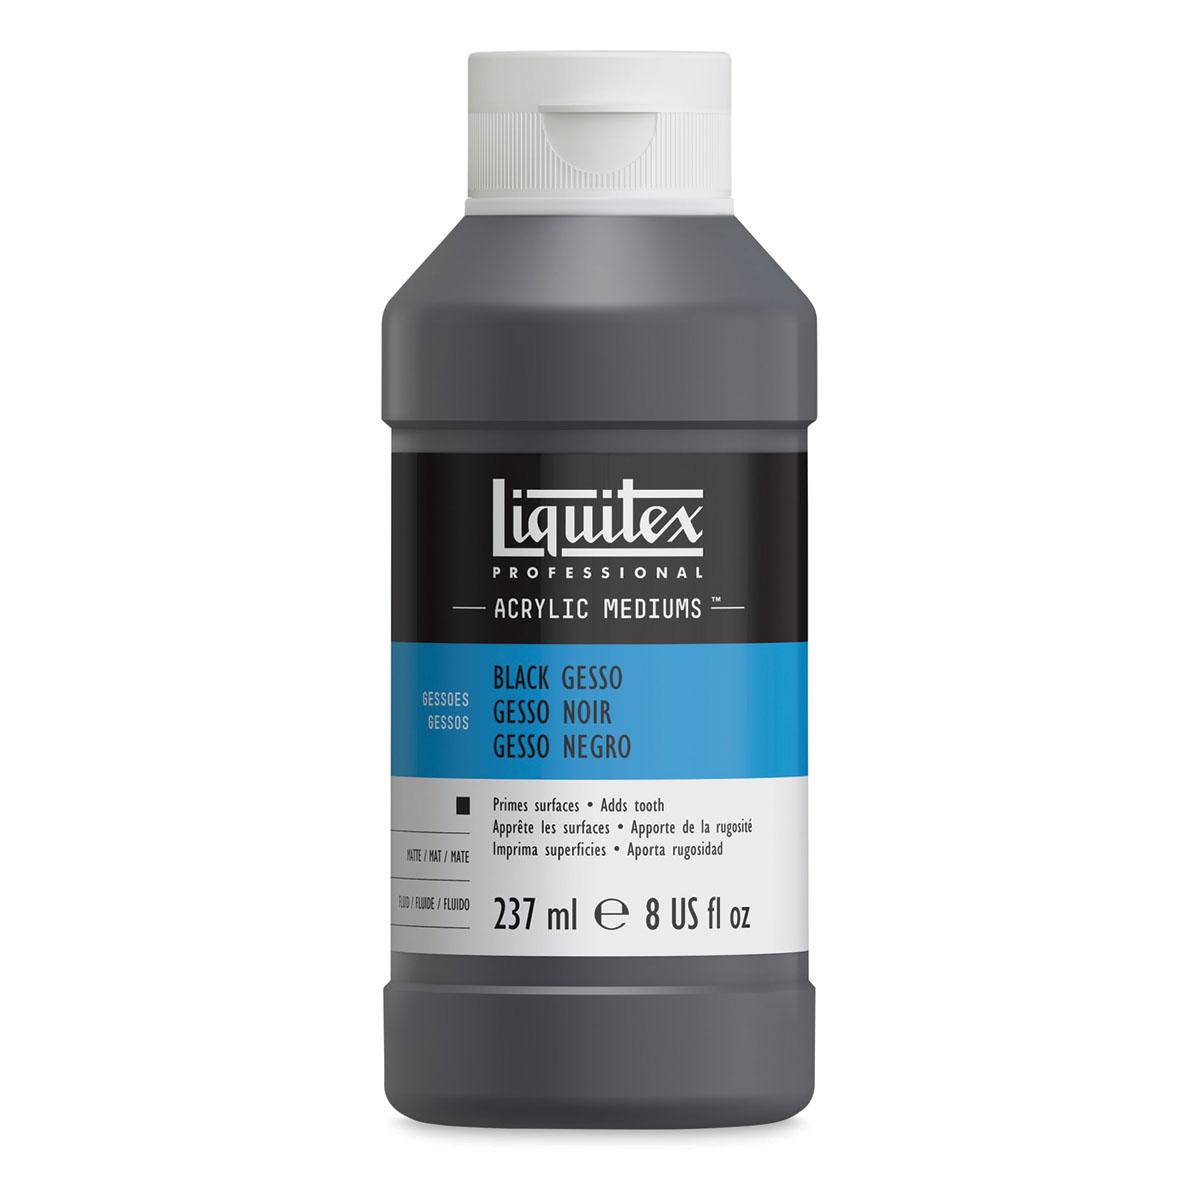 Liquitex Acrylic Gesso - Black, 8 oz bottle